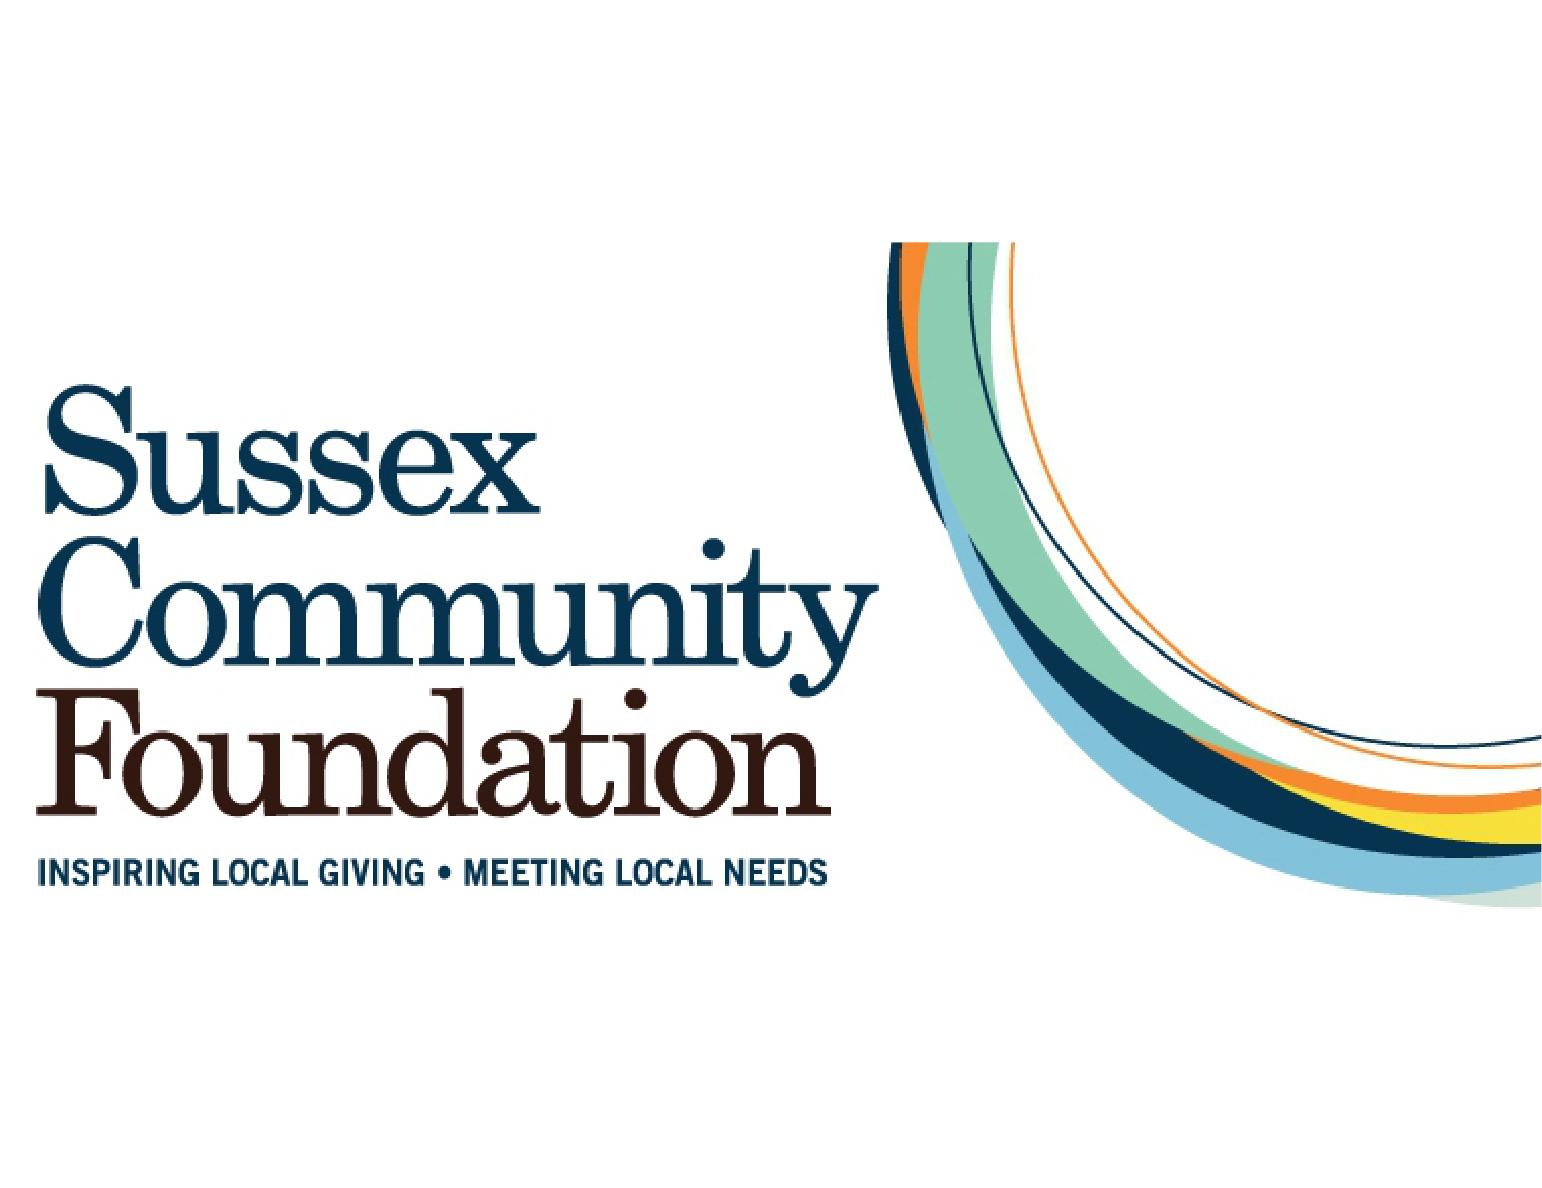 sussex-community-foundation-un